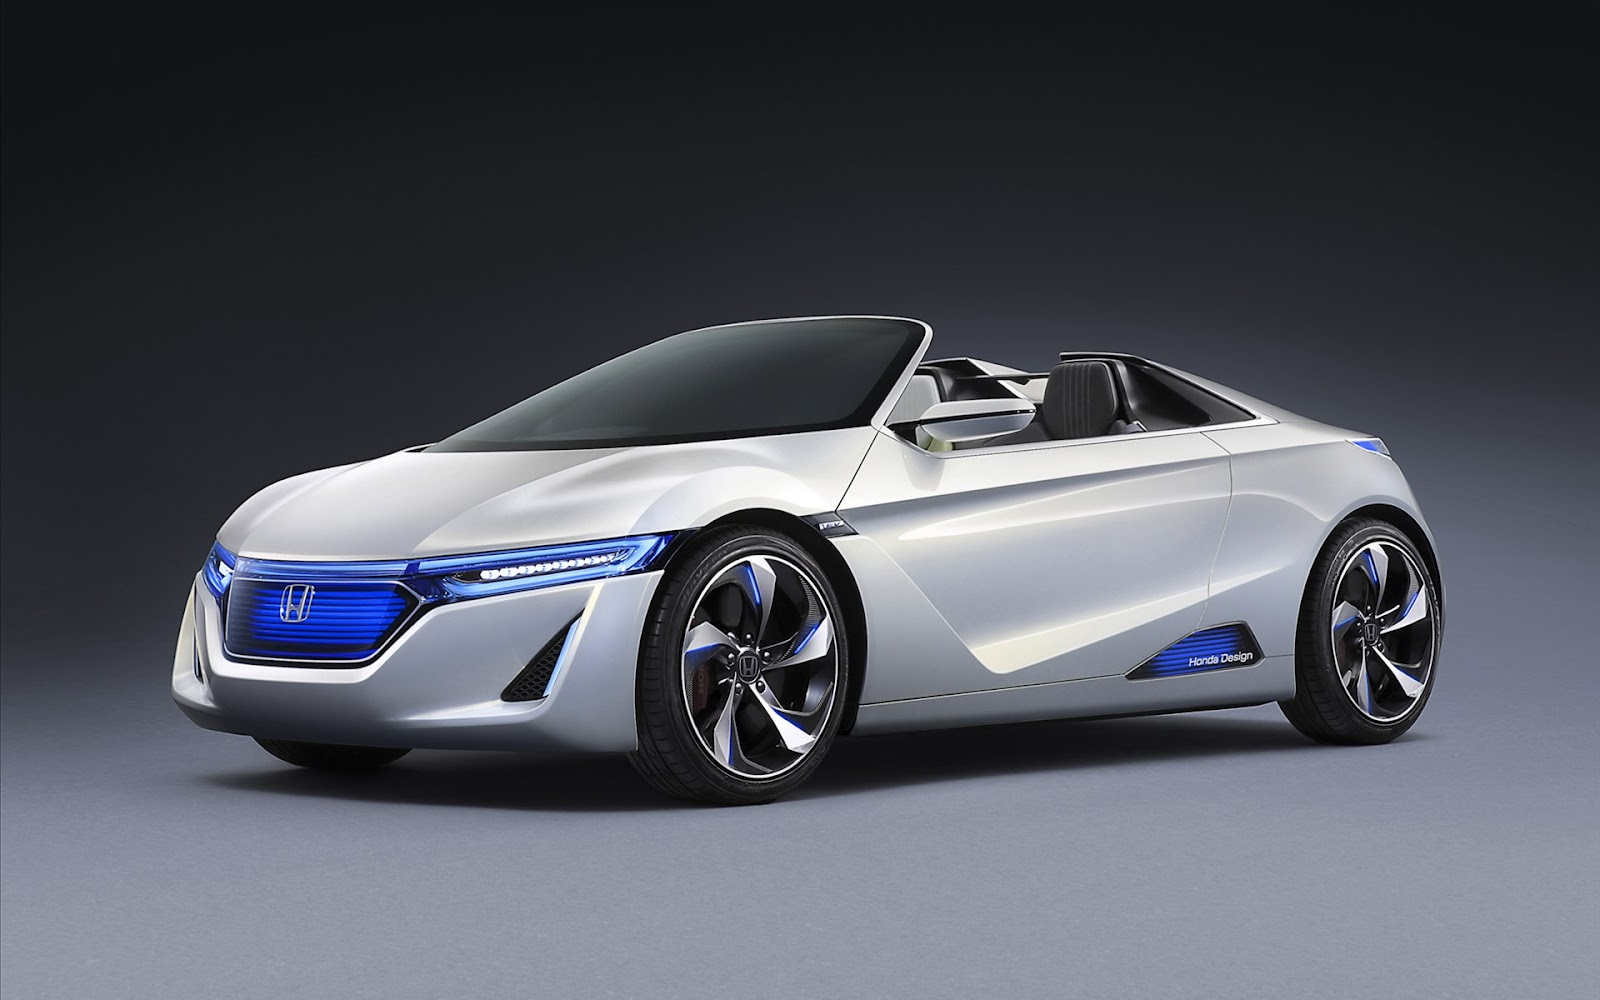 Honda Concept Car Desktop Backgrounds Wallpaper